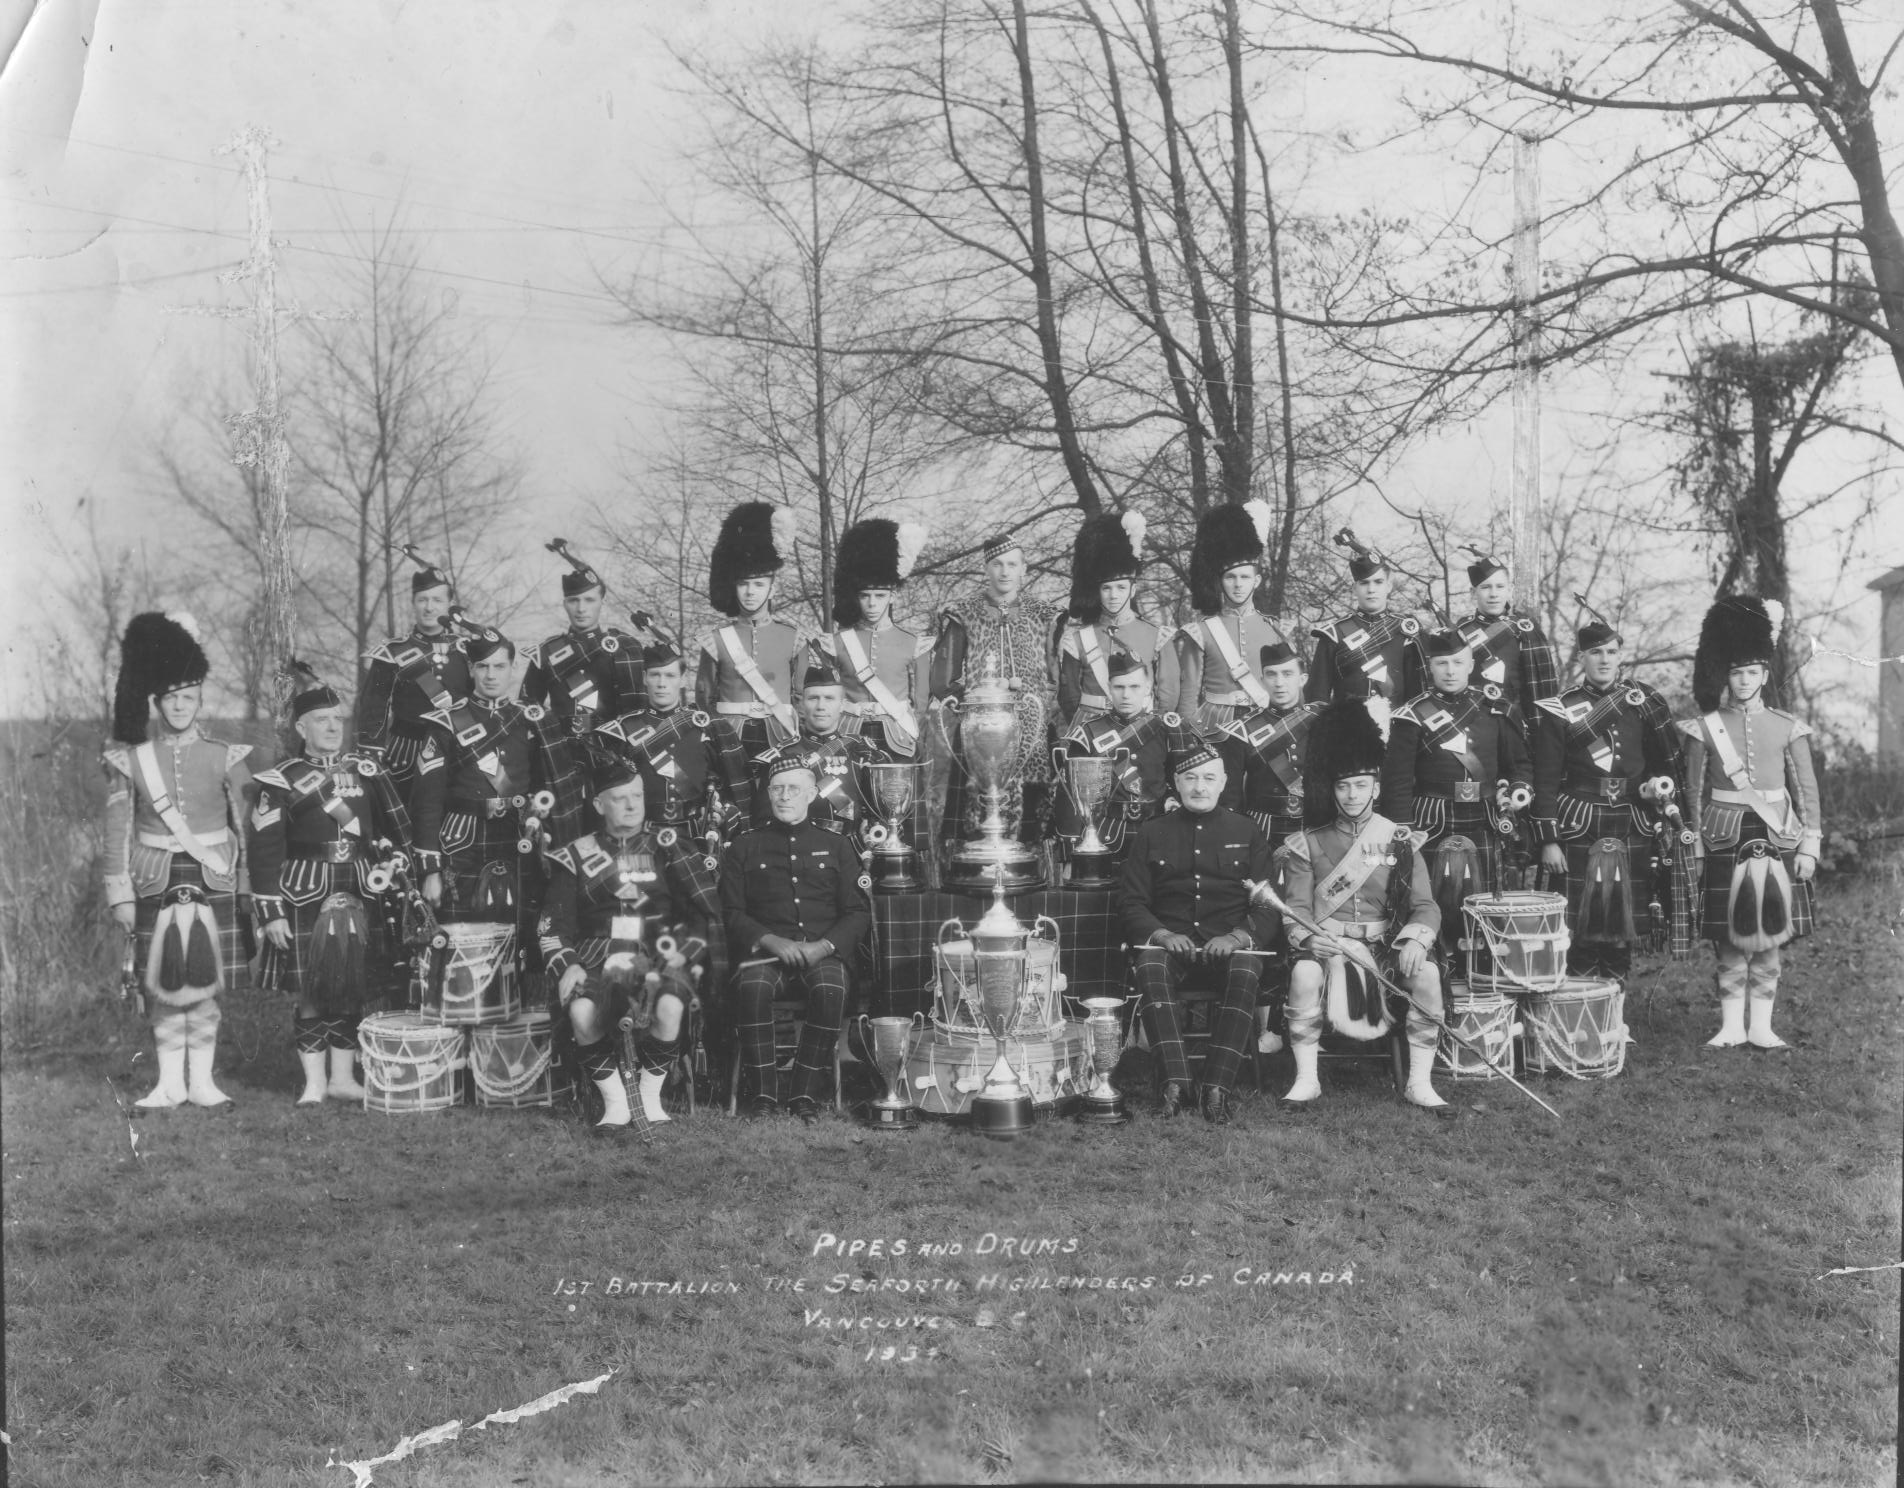 James Robertson - Seaforth Highlanders Pipe Band